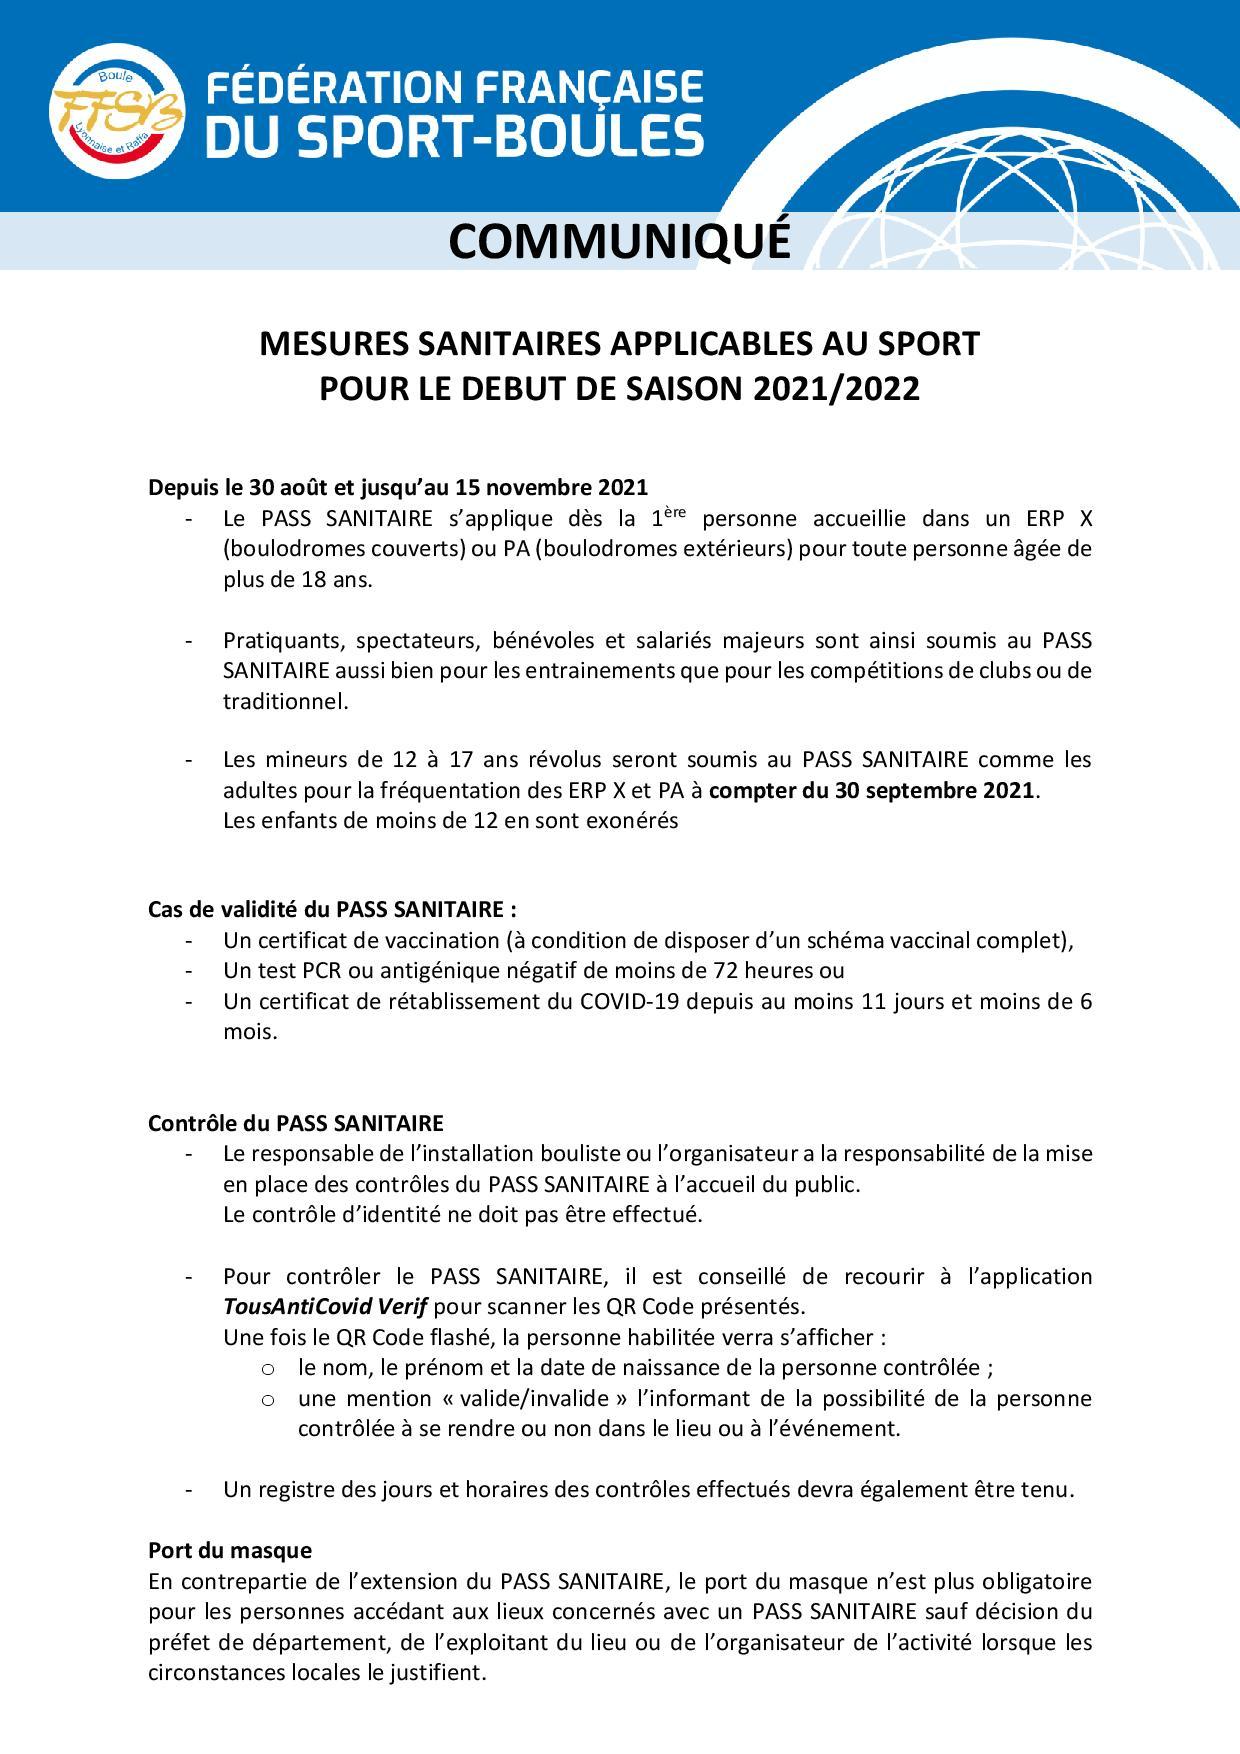 FFSB Communiqué 15-09-21 (3)-page-001.jpg